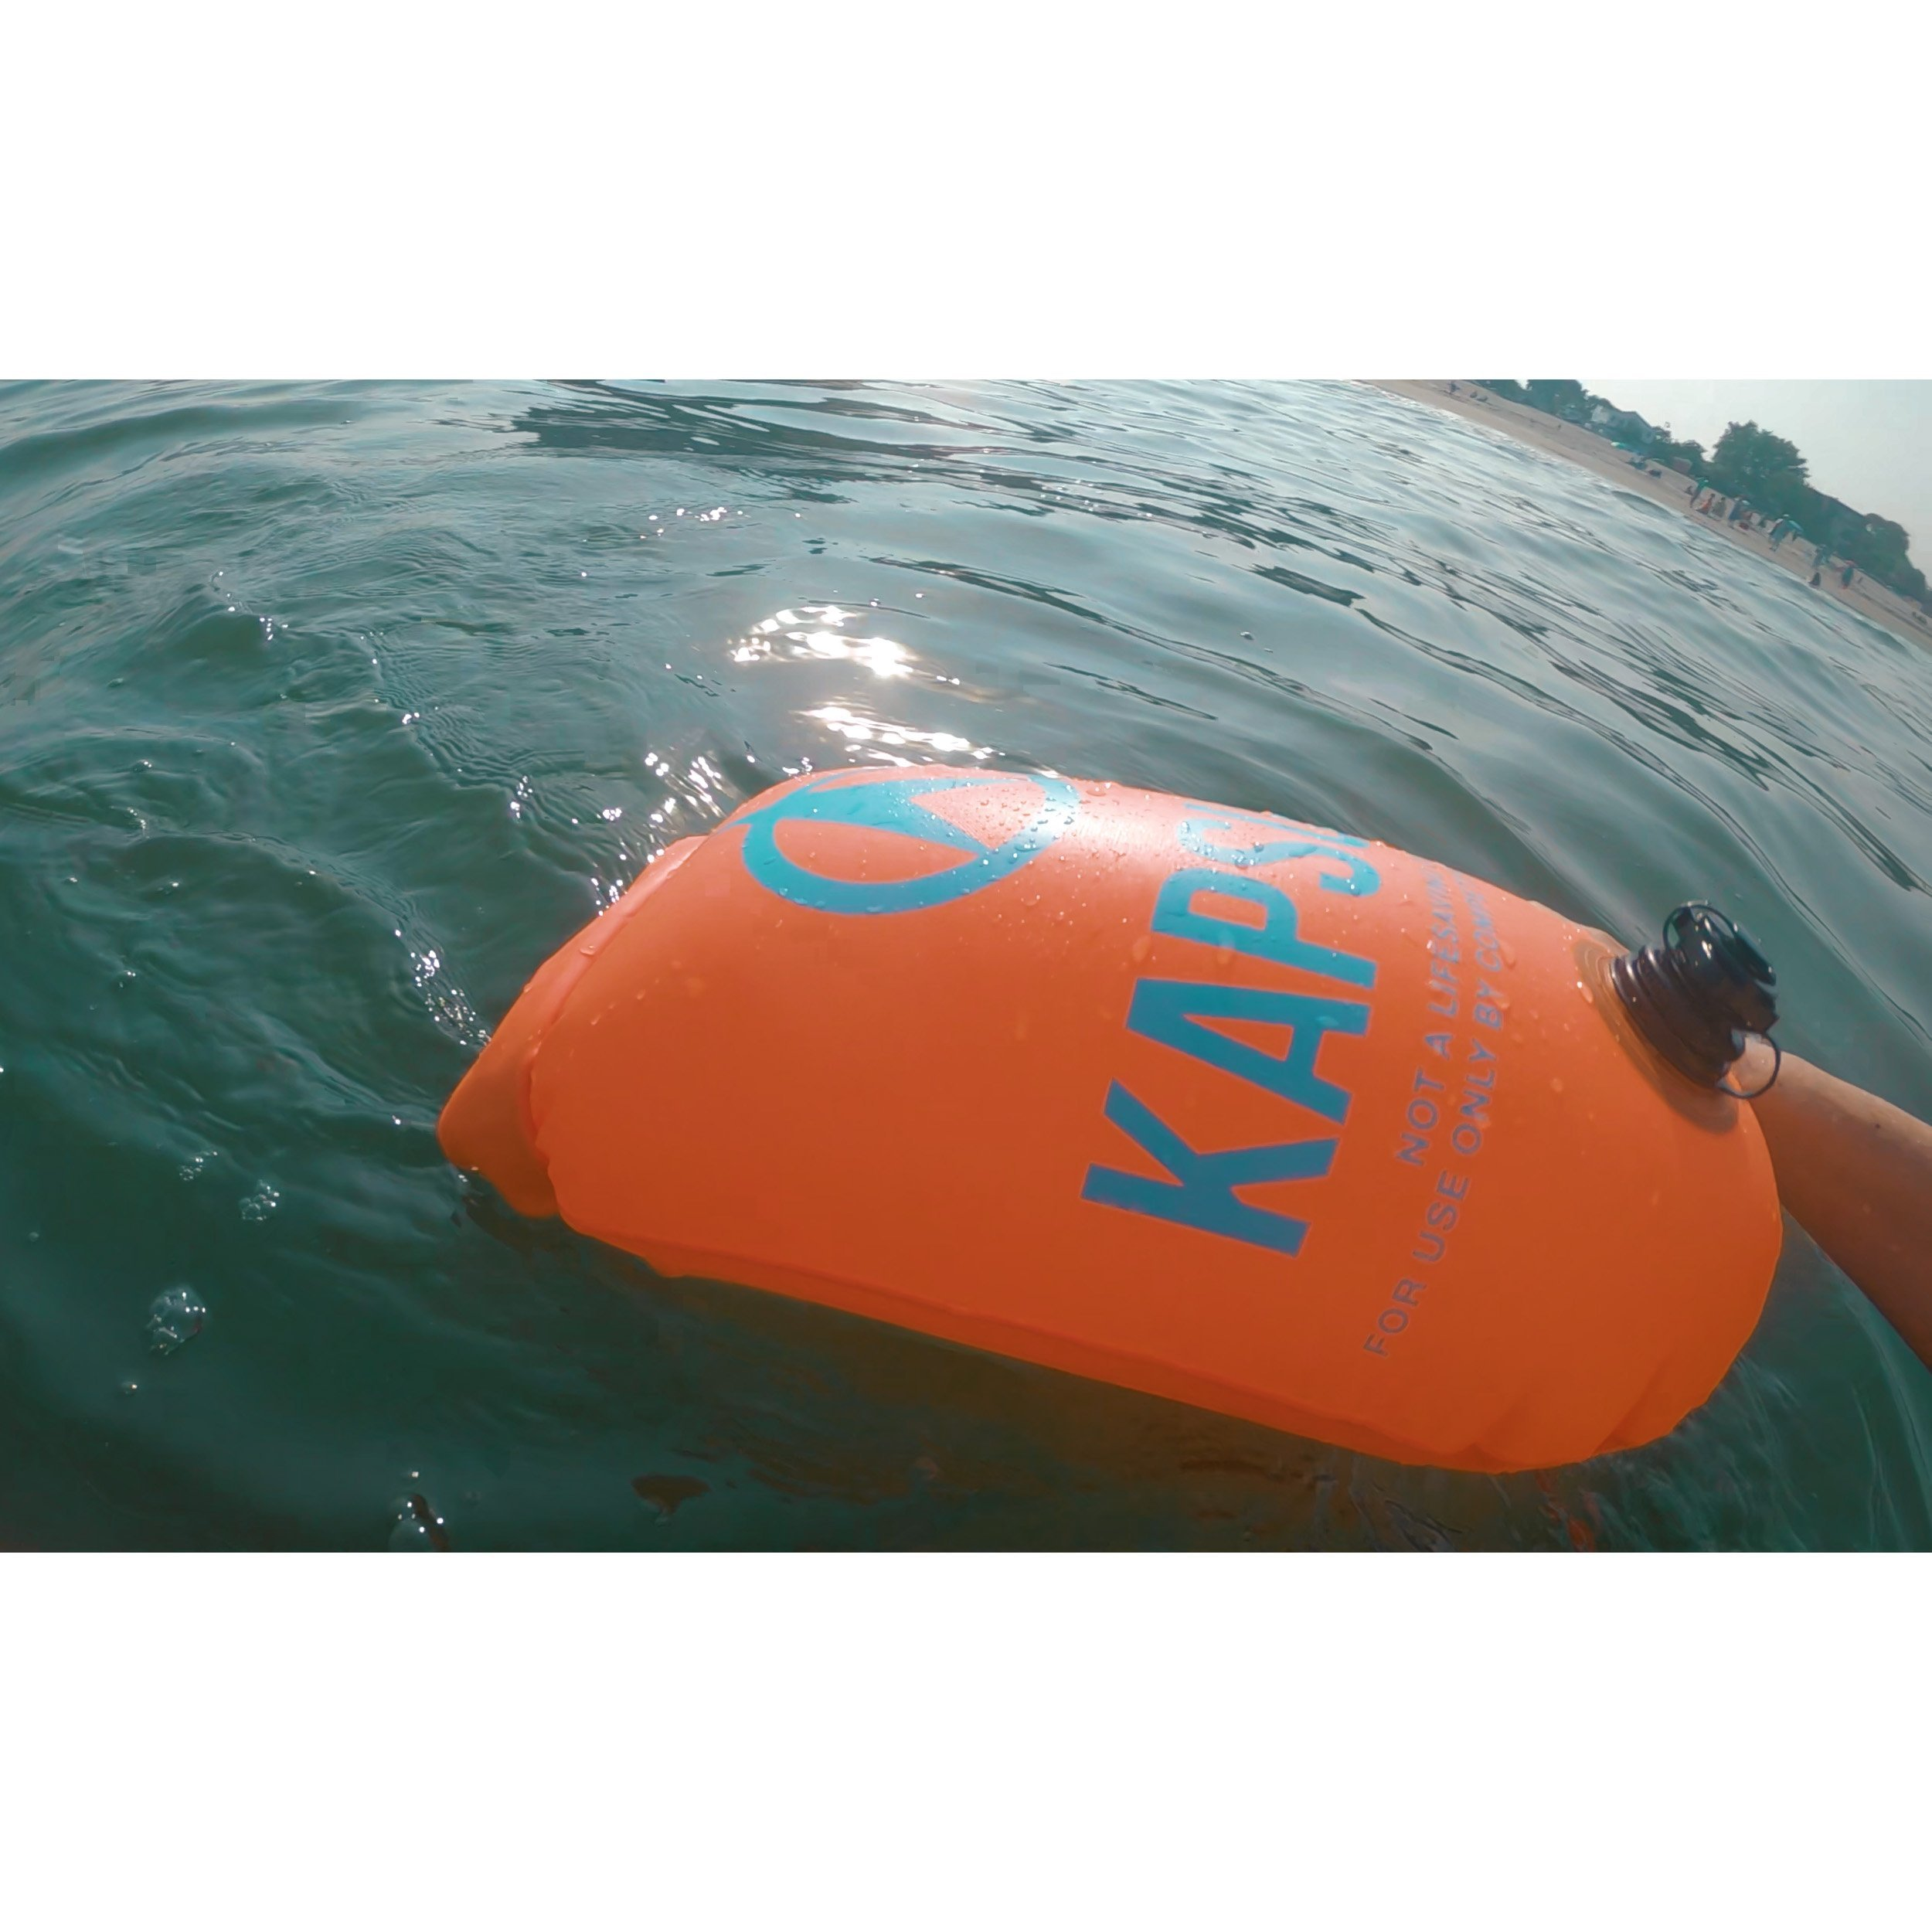 KAPSULE Swim Buoy (NEON 20L Orange) - Personal Swimming Float and Dry Bag by KAPSULE (Image #8)